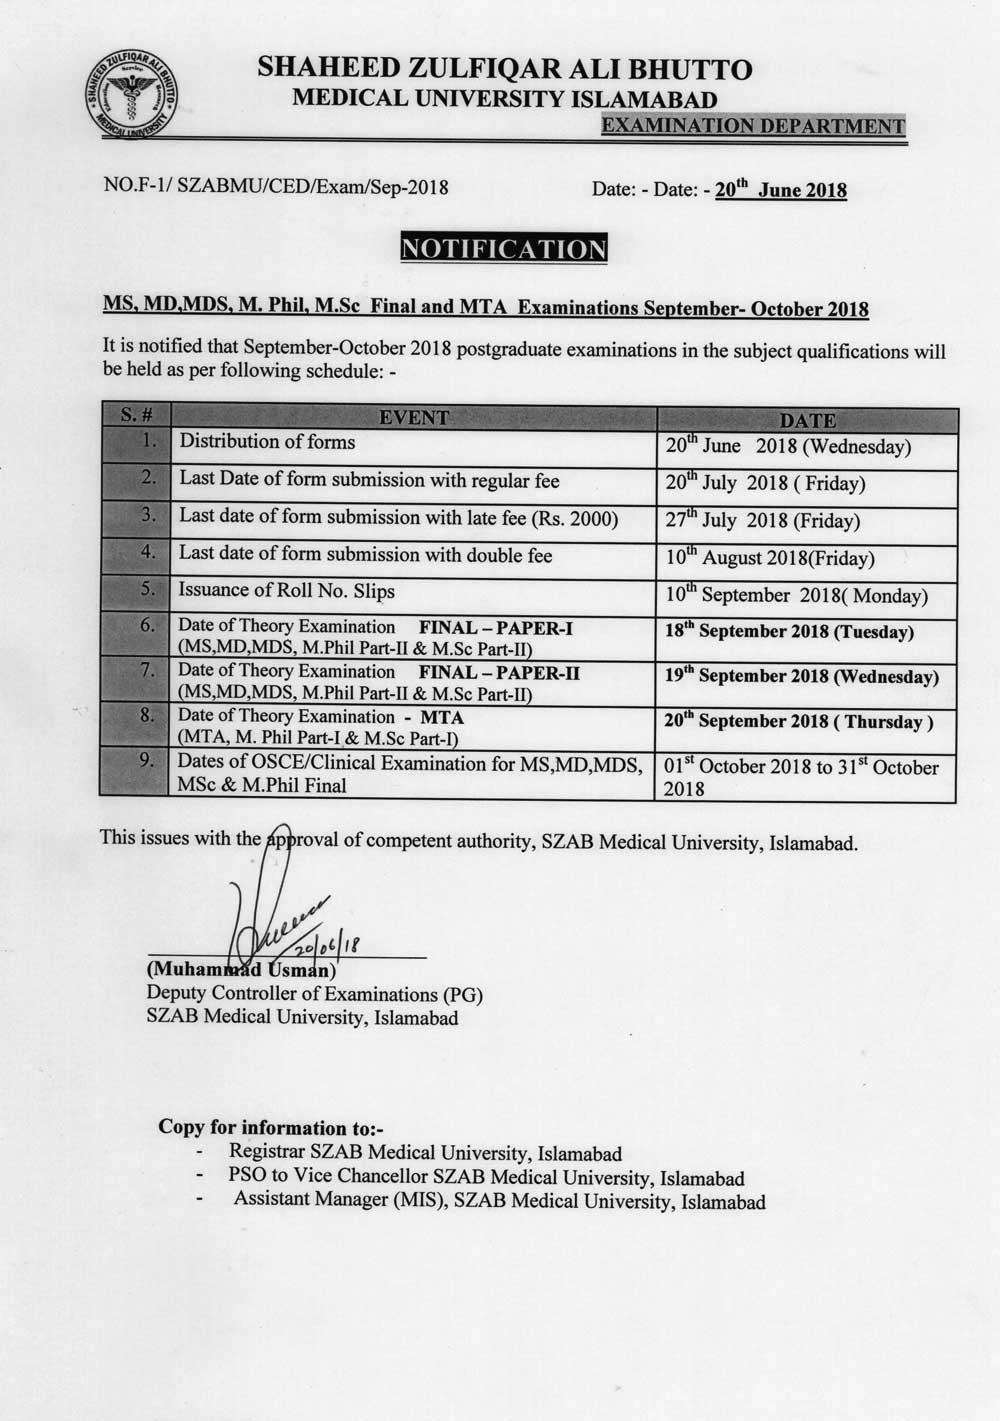 Notification - Sep/October 2018 Postgraduate Examination